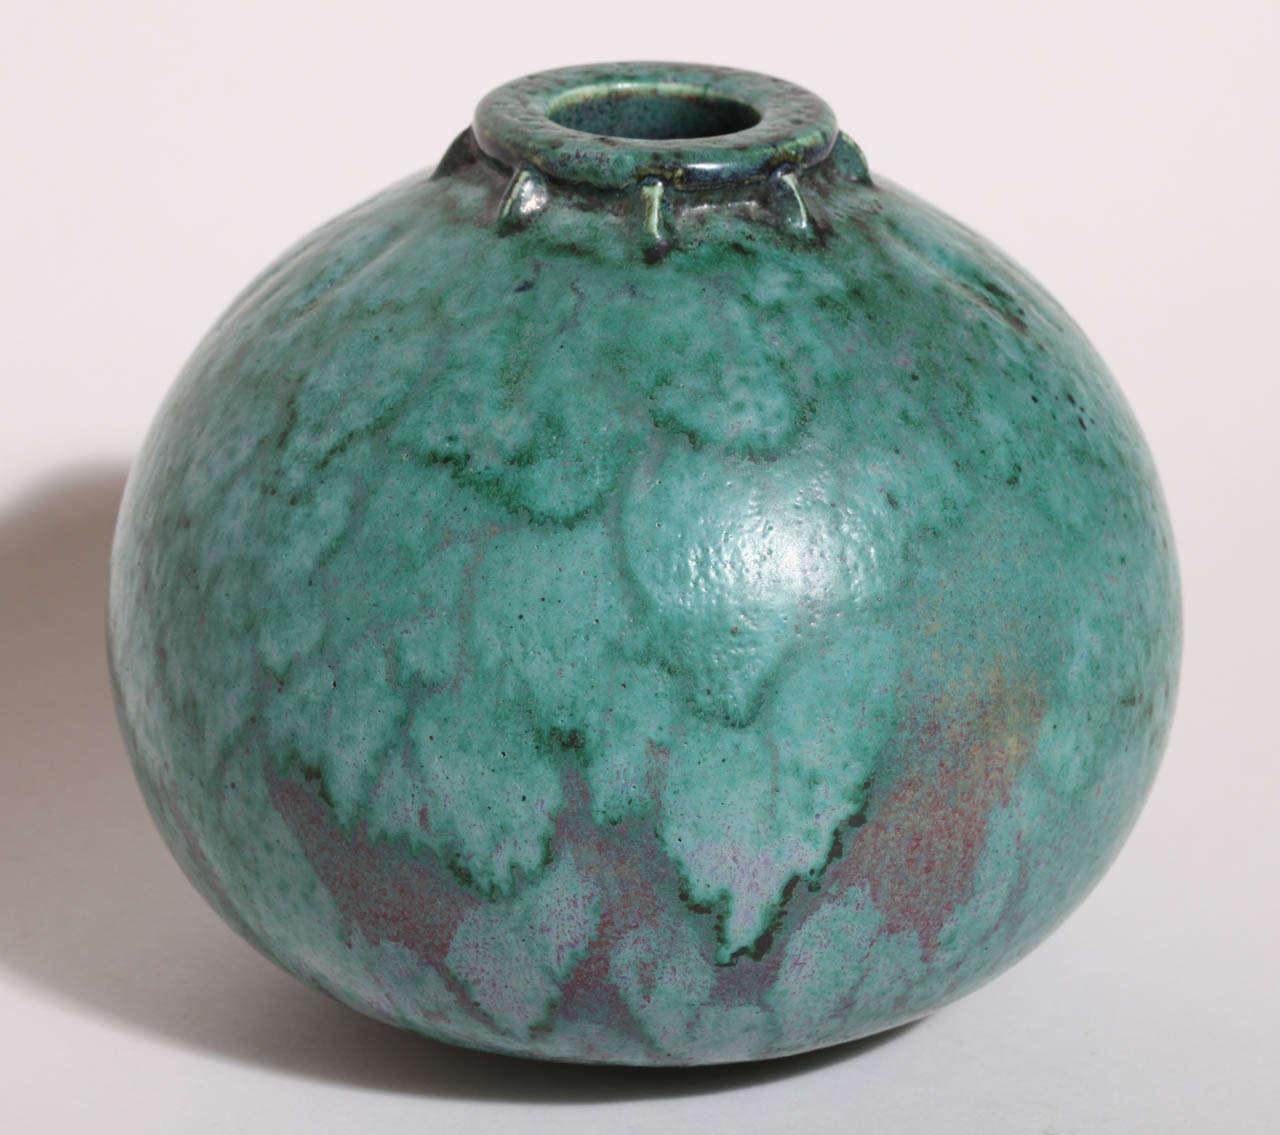 Emile Decoeur French Art Deco Turquoise Stoneware Vase For Sale 2